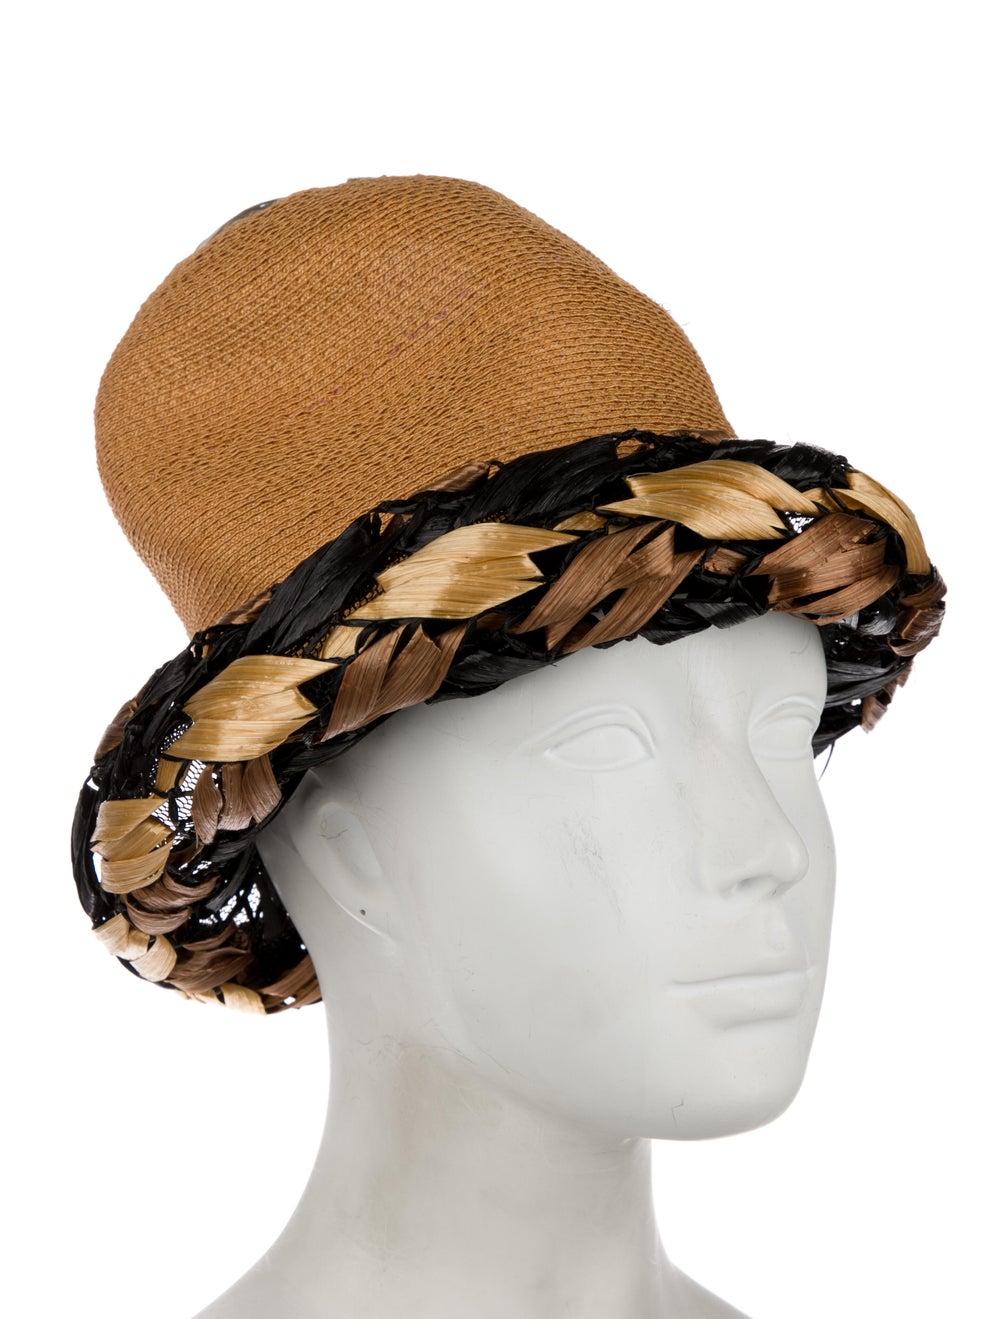 Christian Dior Vintage Straw Hat tan - image 3